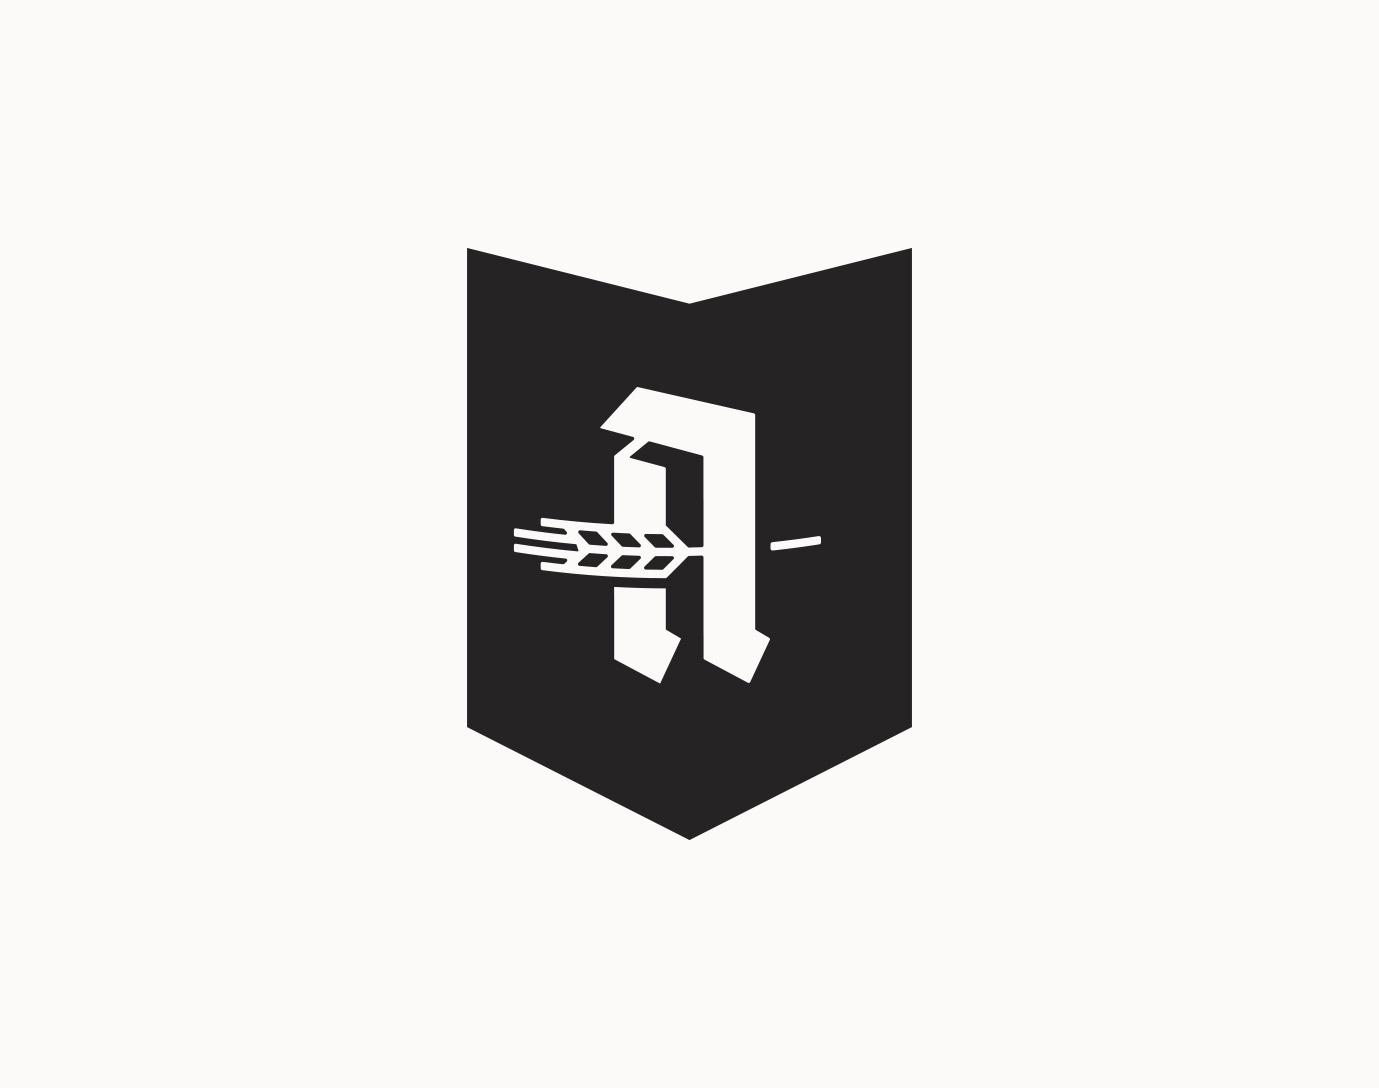 logos20.jpg